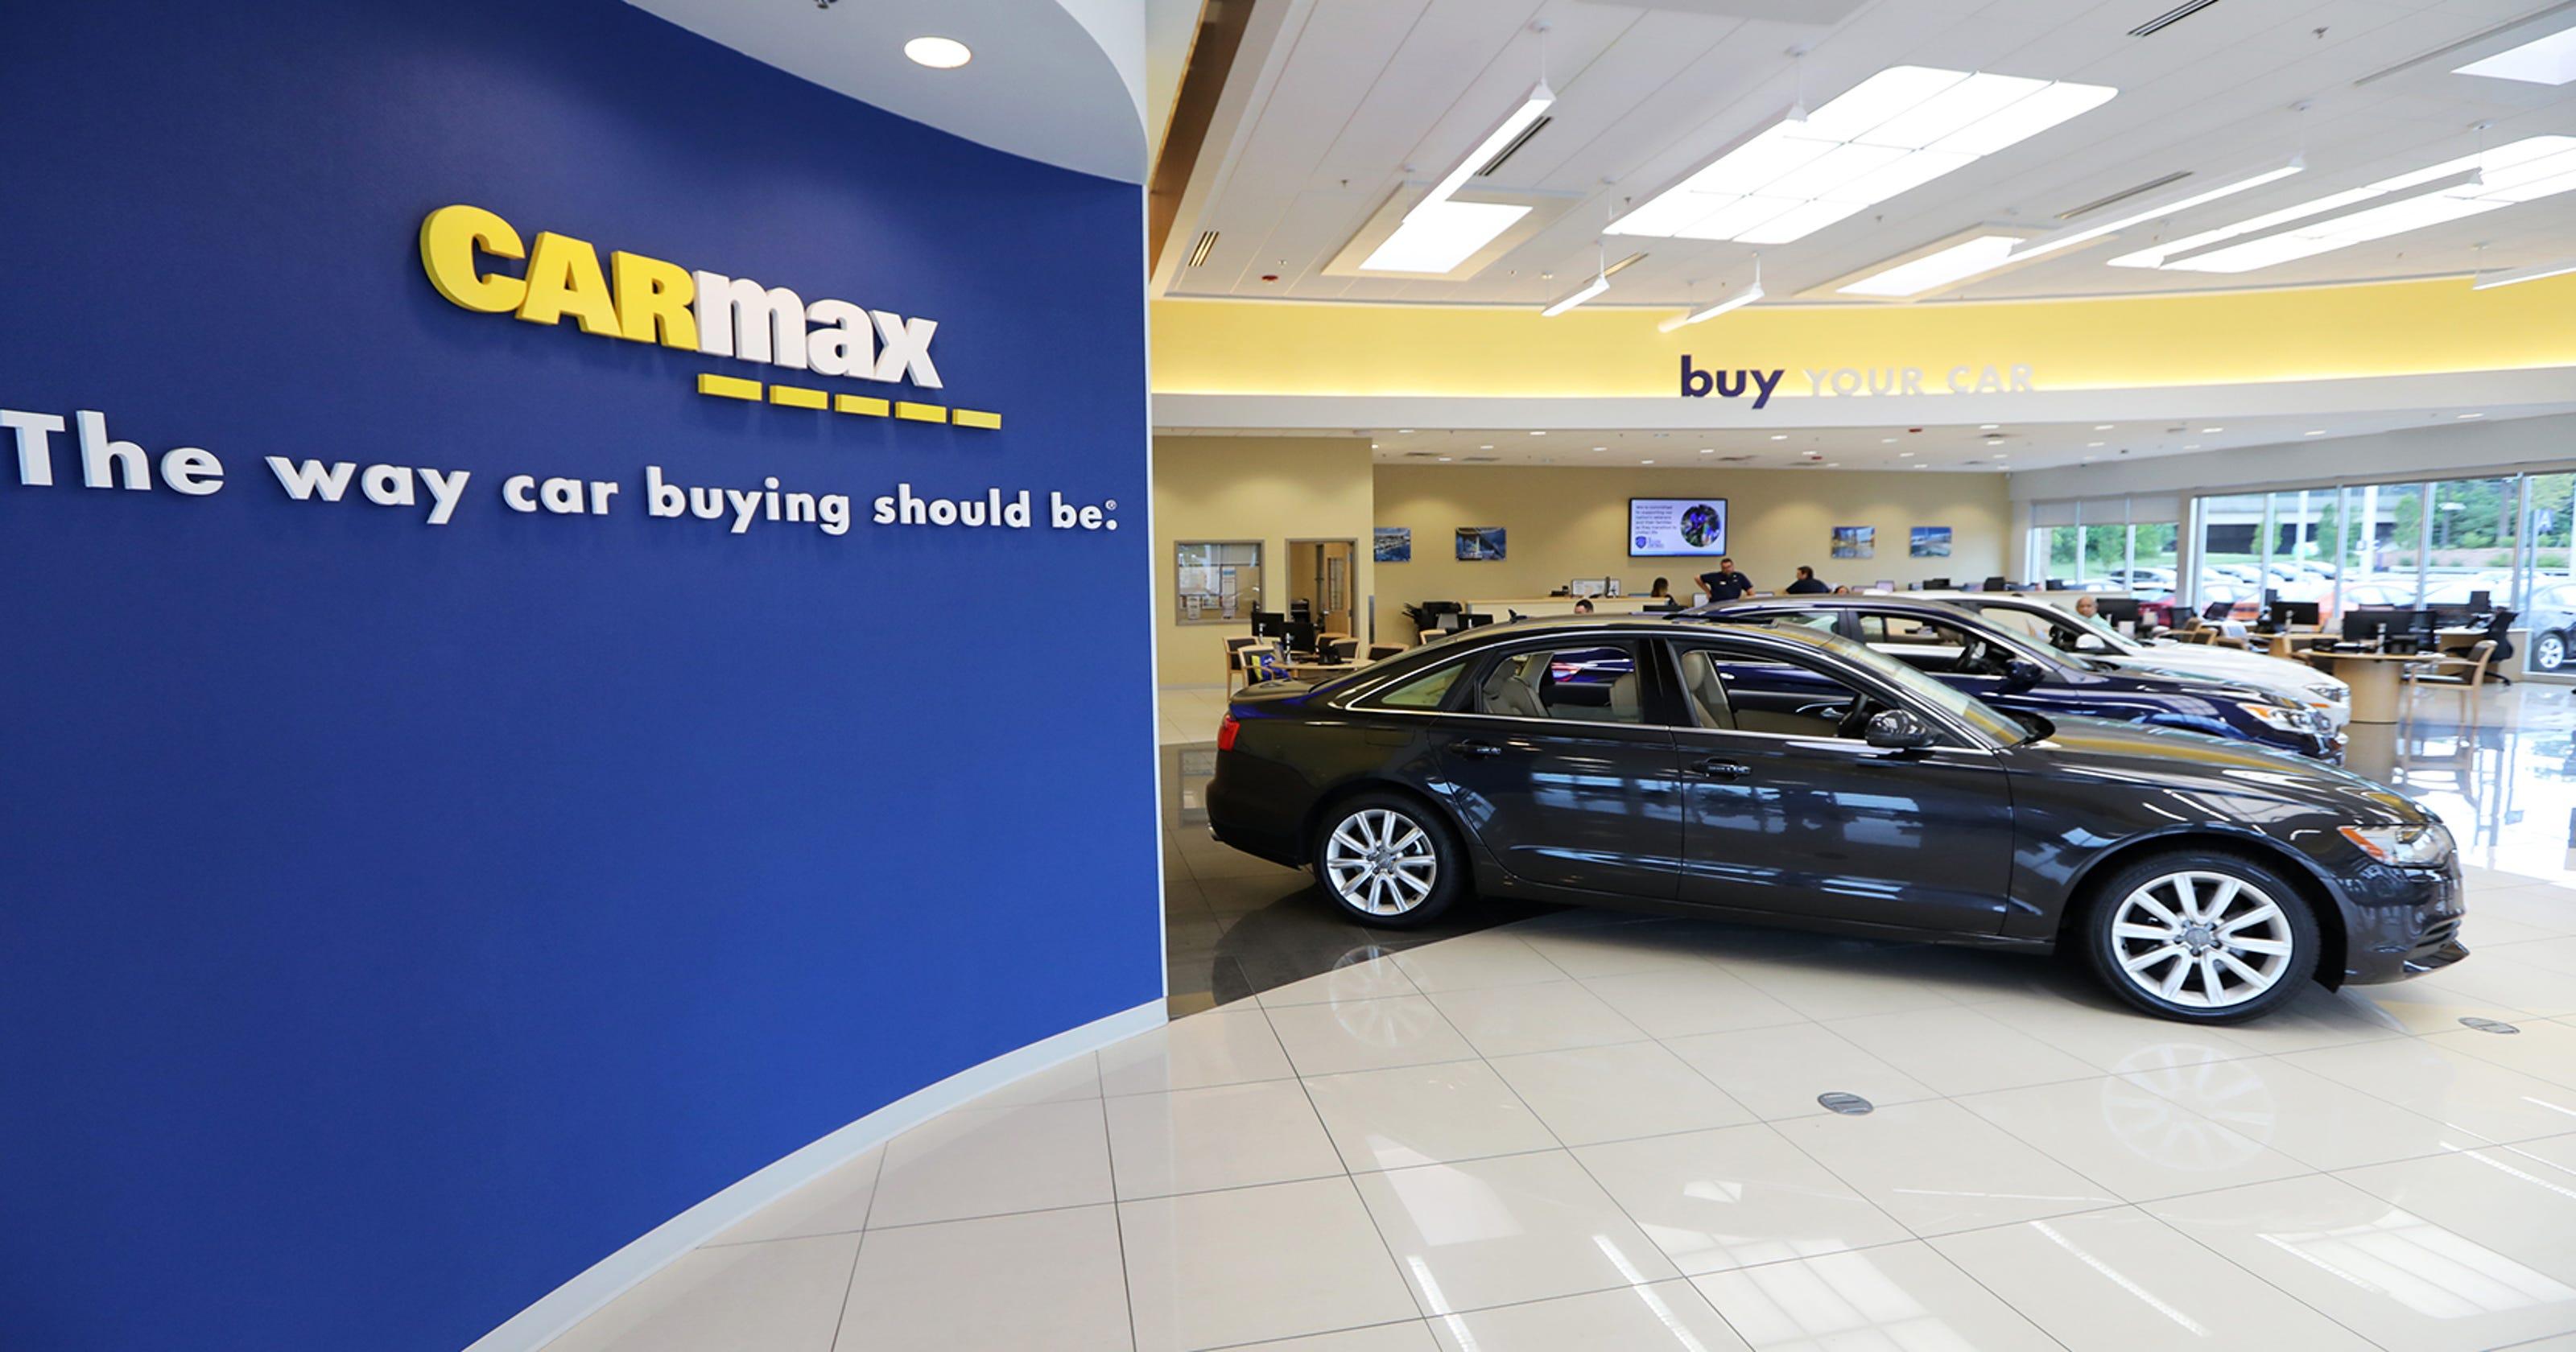 carmax still facing roadblocks in its bid to open in paramus